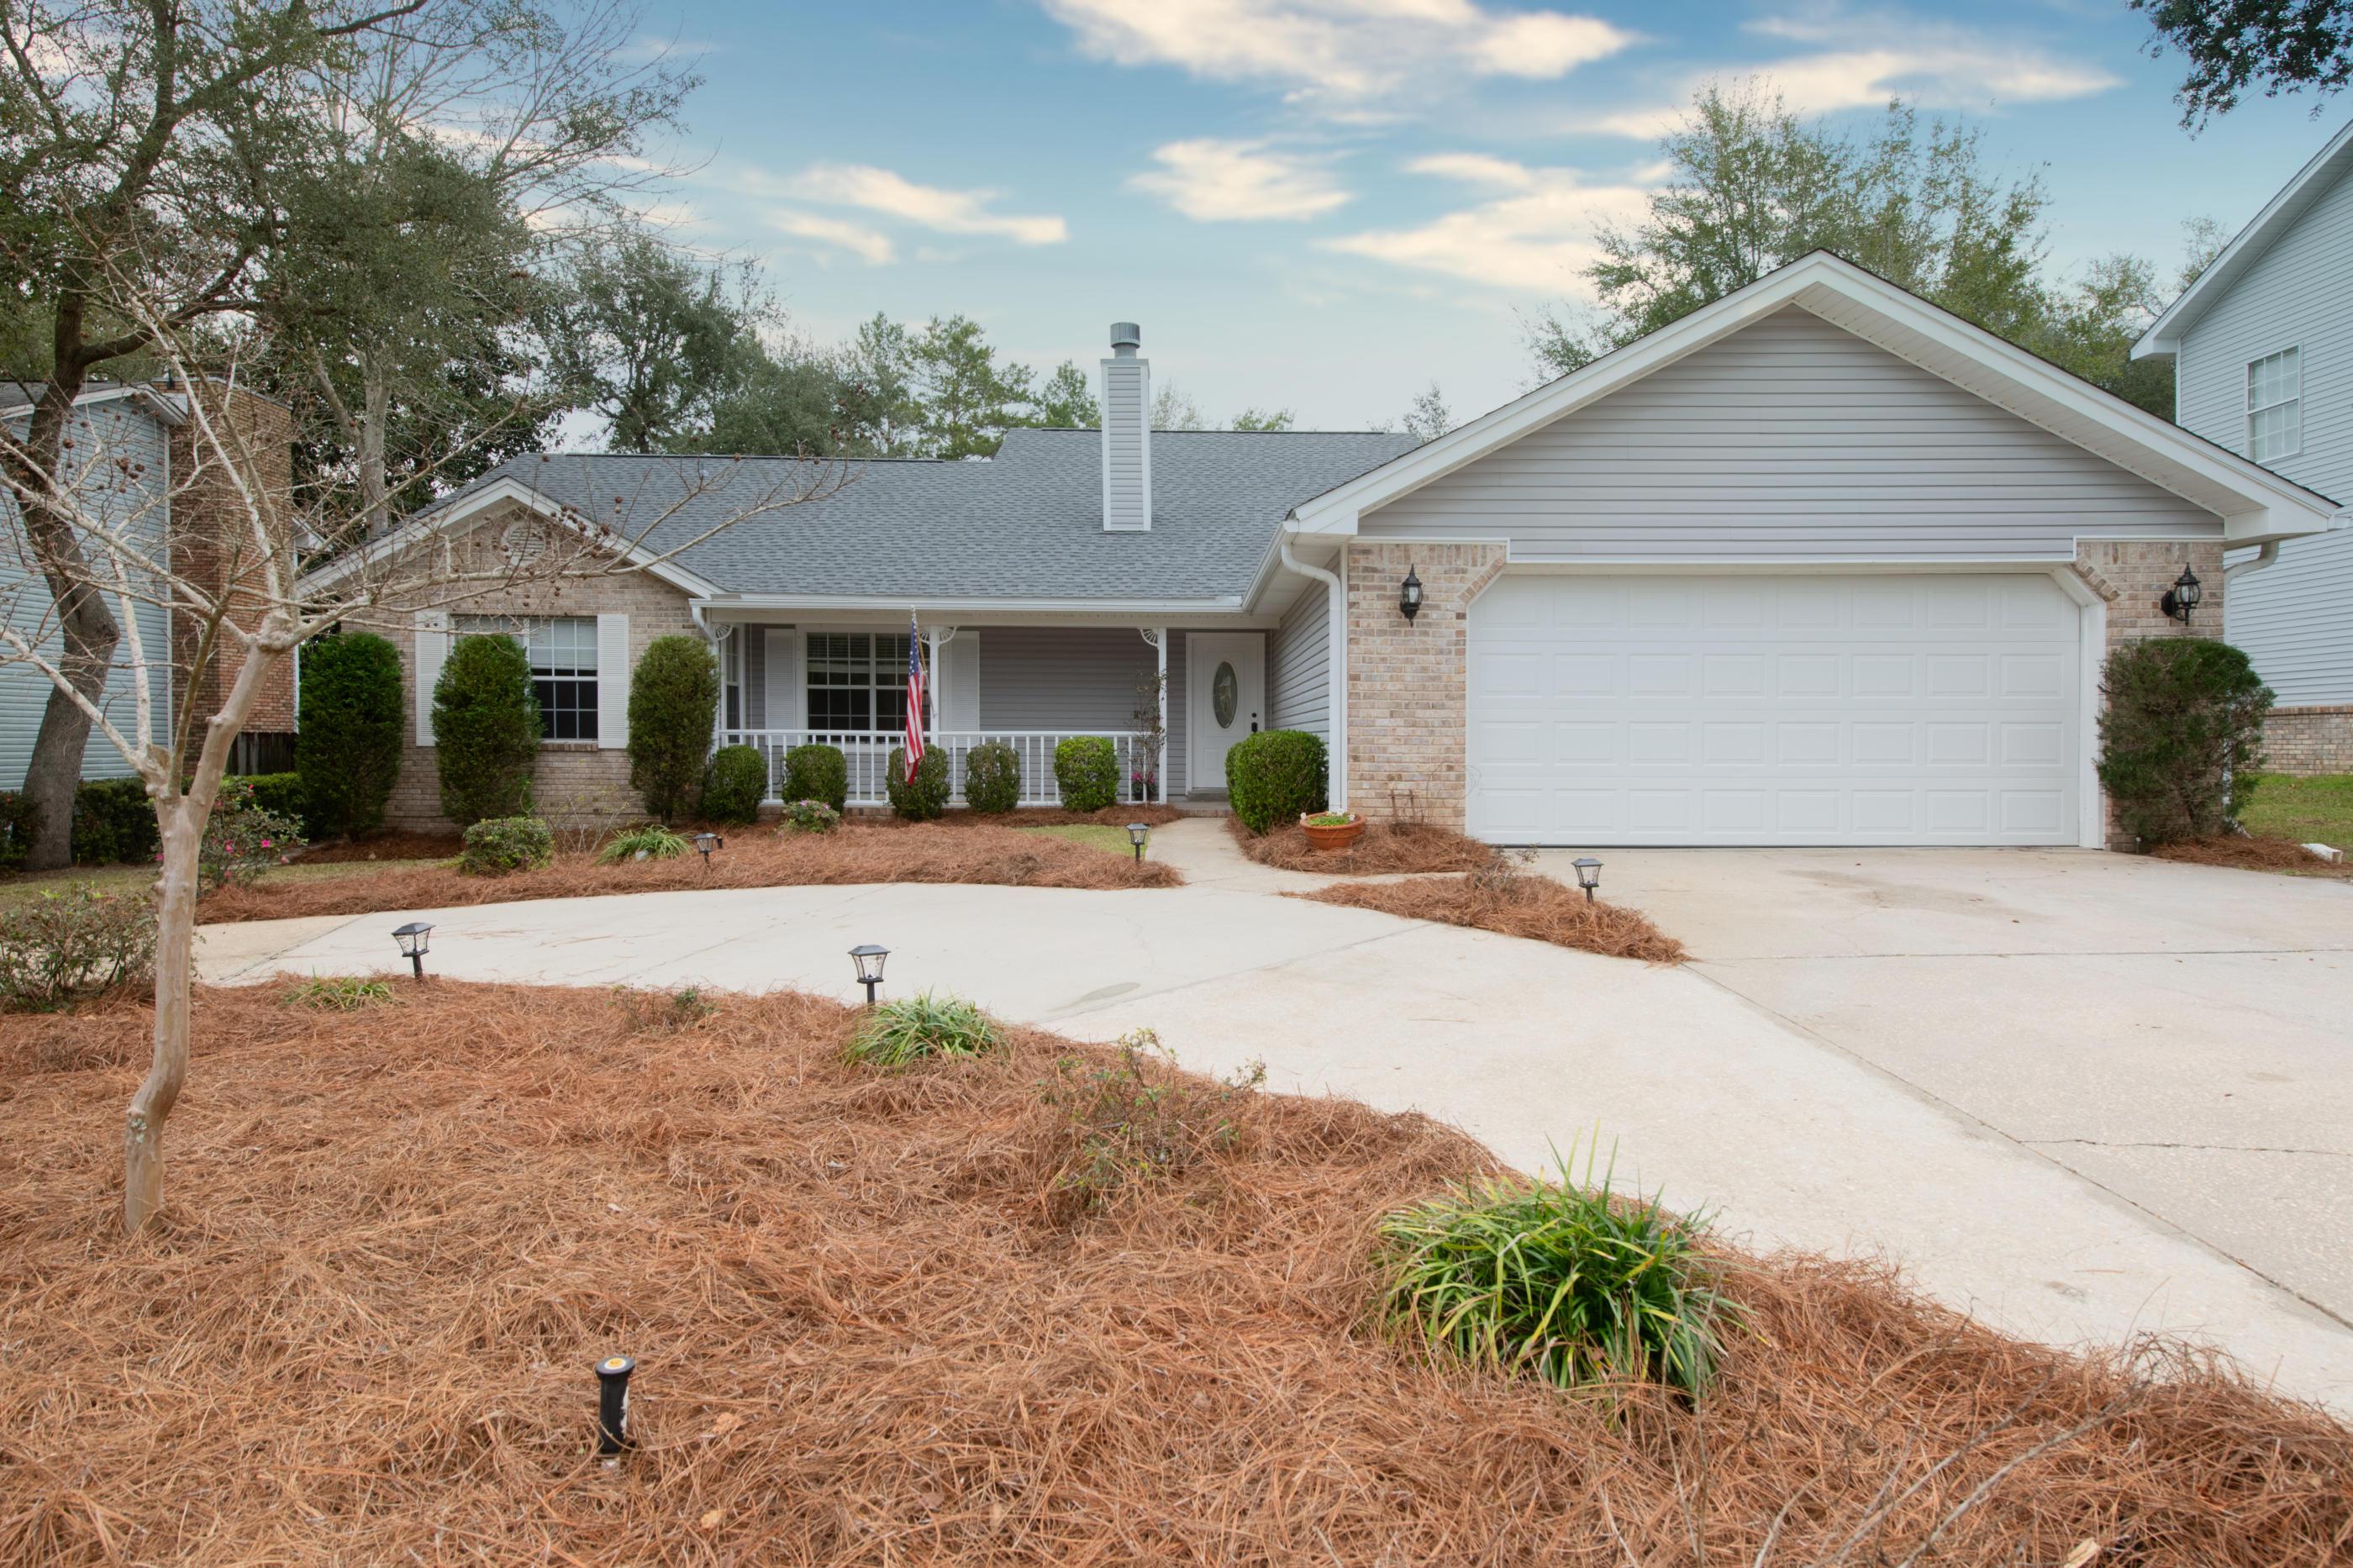 522  Garden Oaks Cove, Niceville in Okaloosa County, FL 32578 Home for Sale